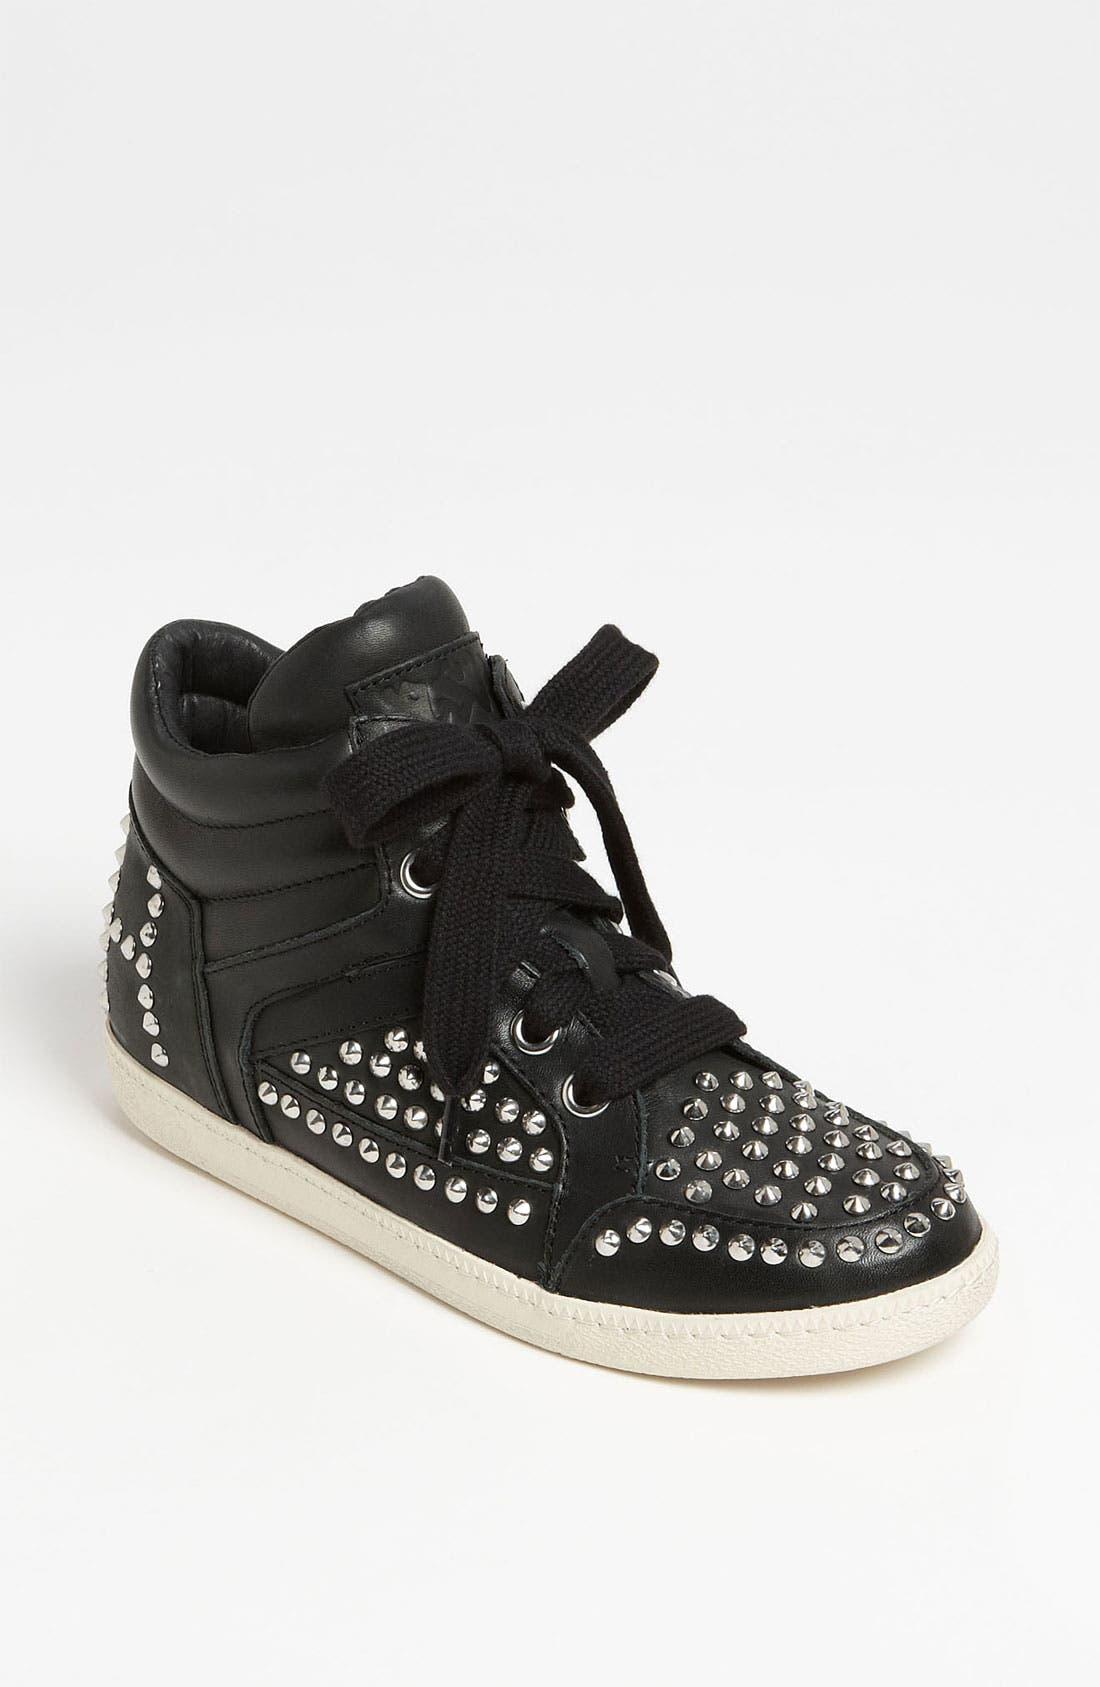 Alternate Image 1 Selected - Ash 'Zest Bis' Sneaker